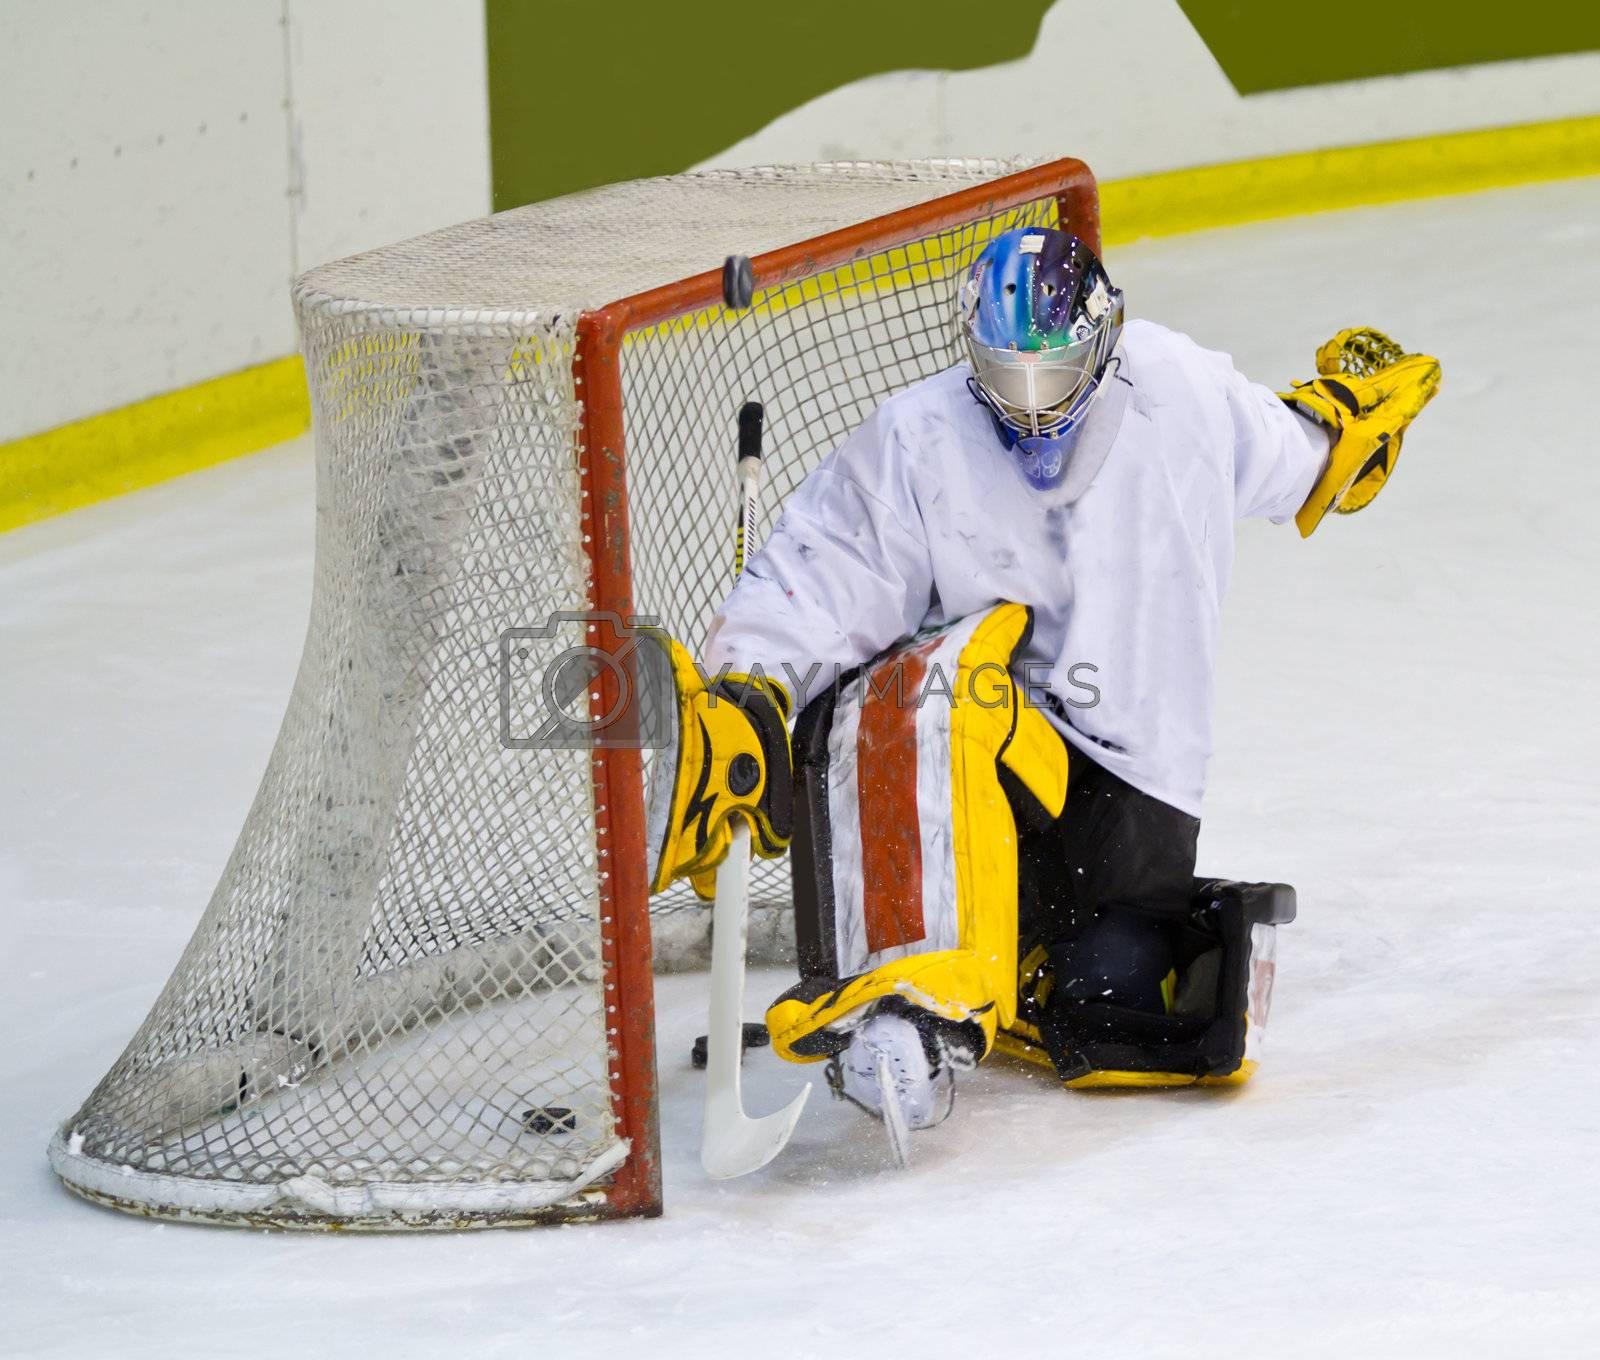 hockey player  by lsantilli